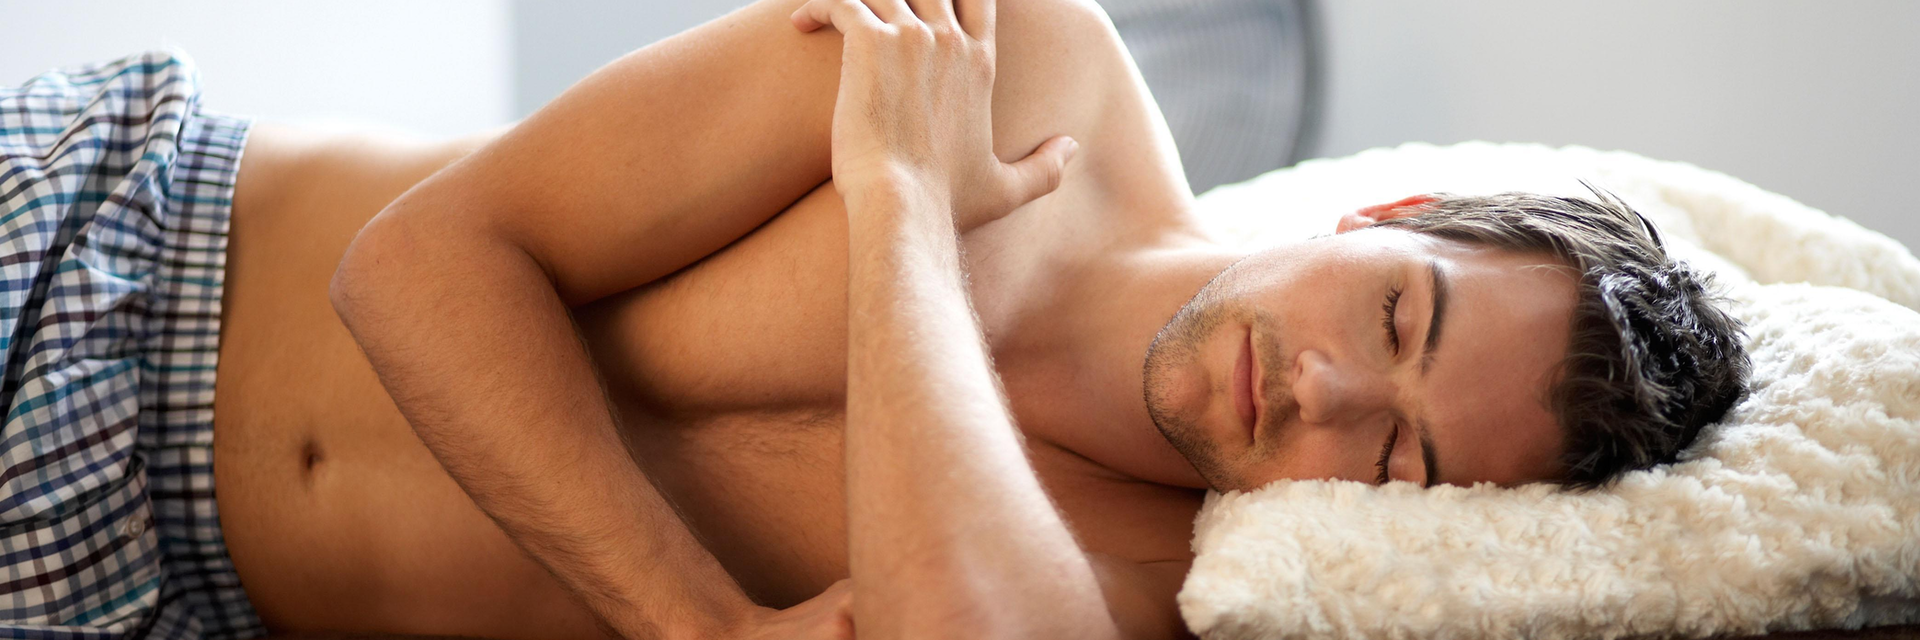 3 Reasons to Sleep in Your Underwear